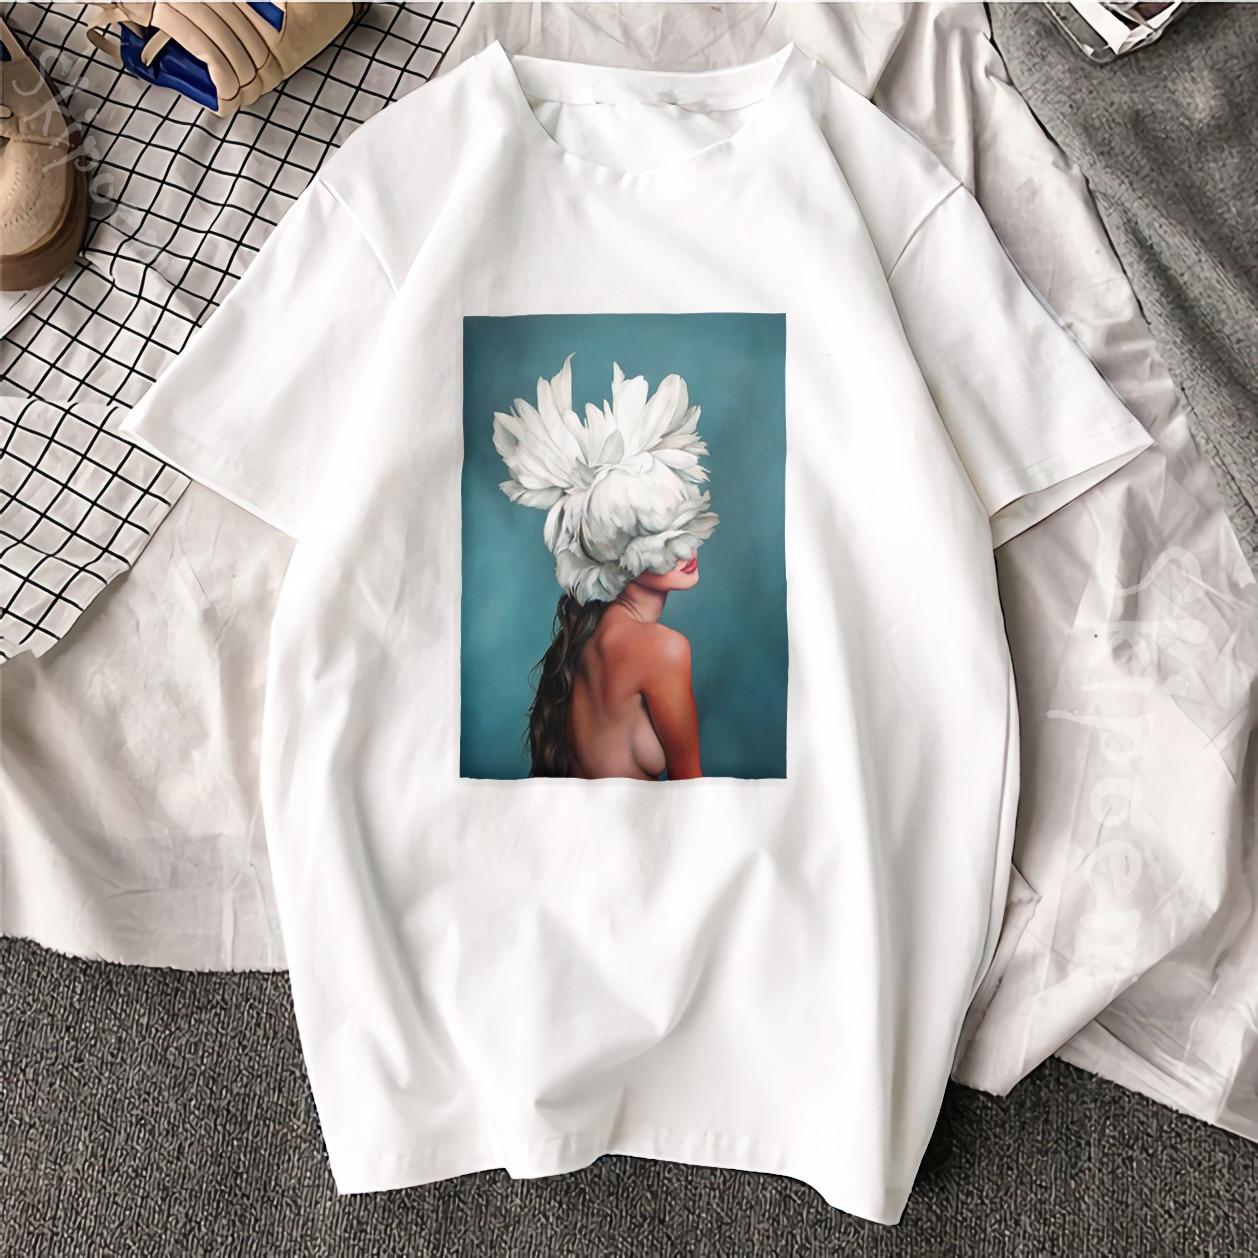 New Cotton Harajuku Aesthetics Tshirt Sexy Flowers Feather Print Short Sleeve Tops & Tees Fashion Casual Couple T Shirt 1